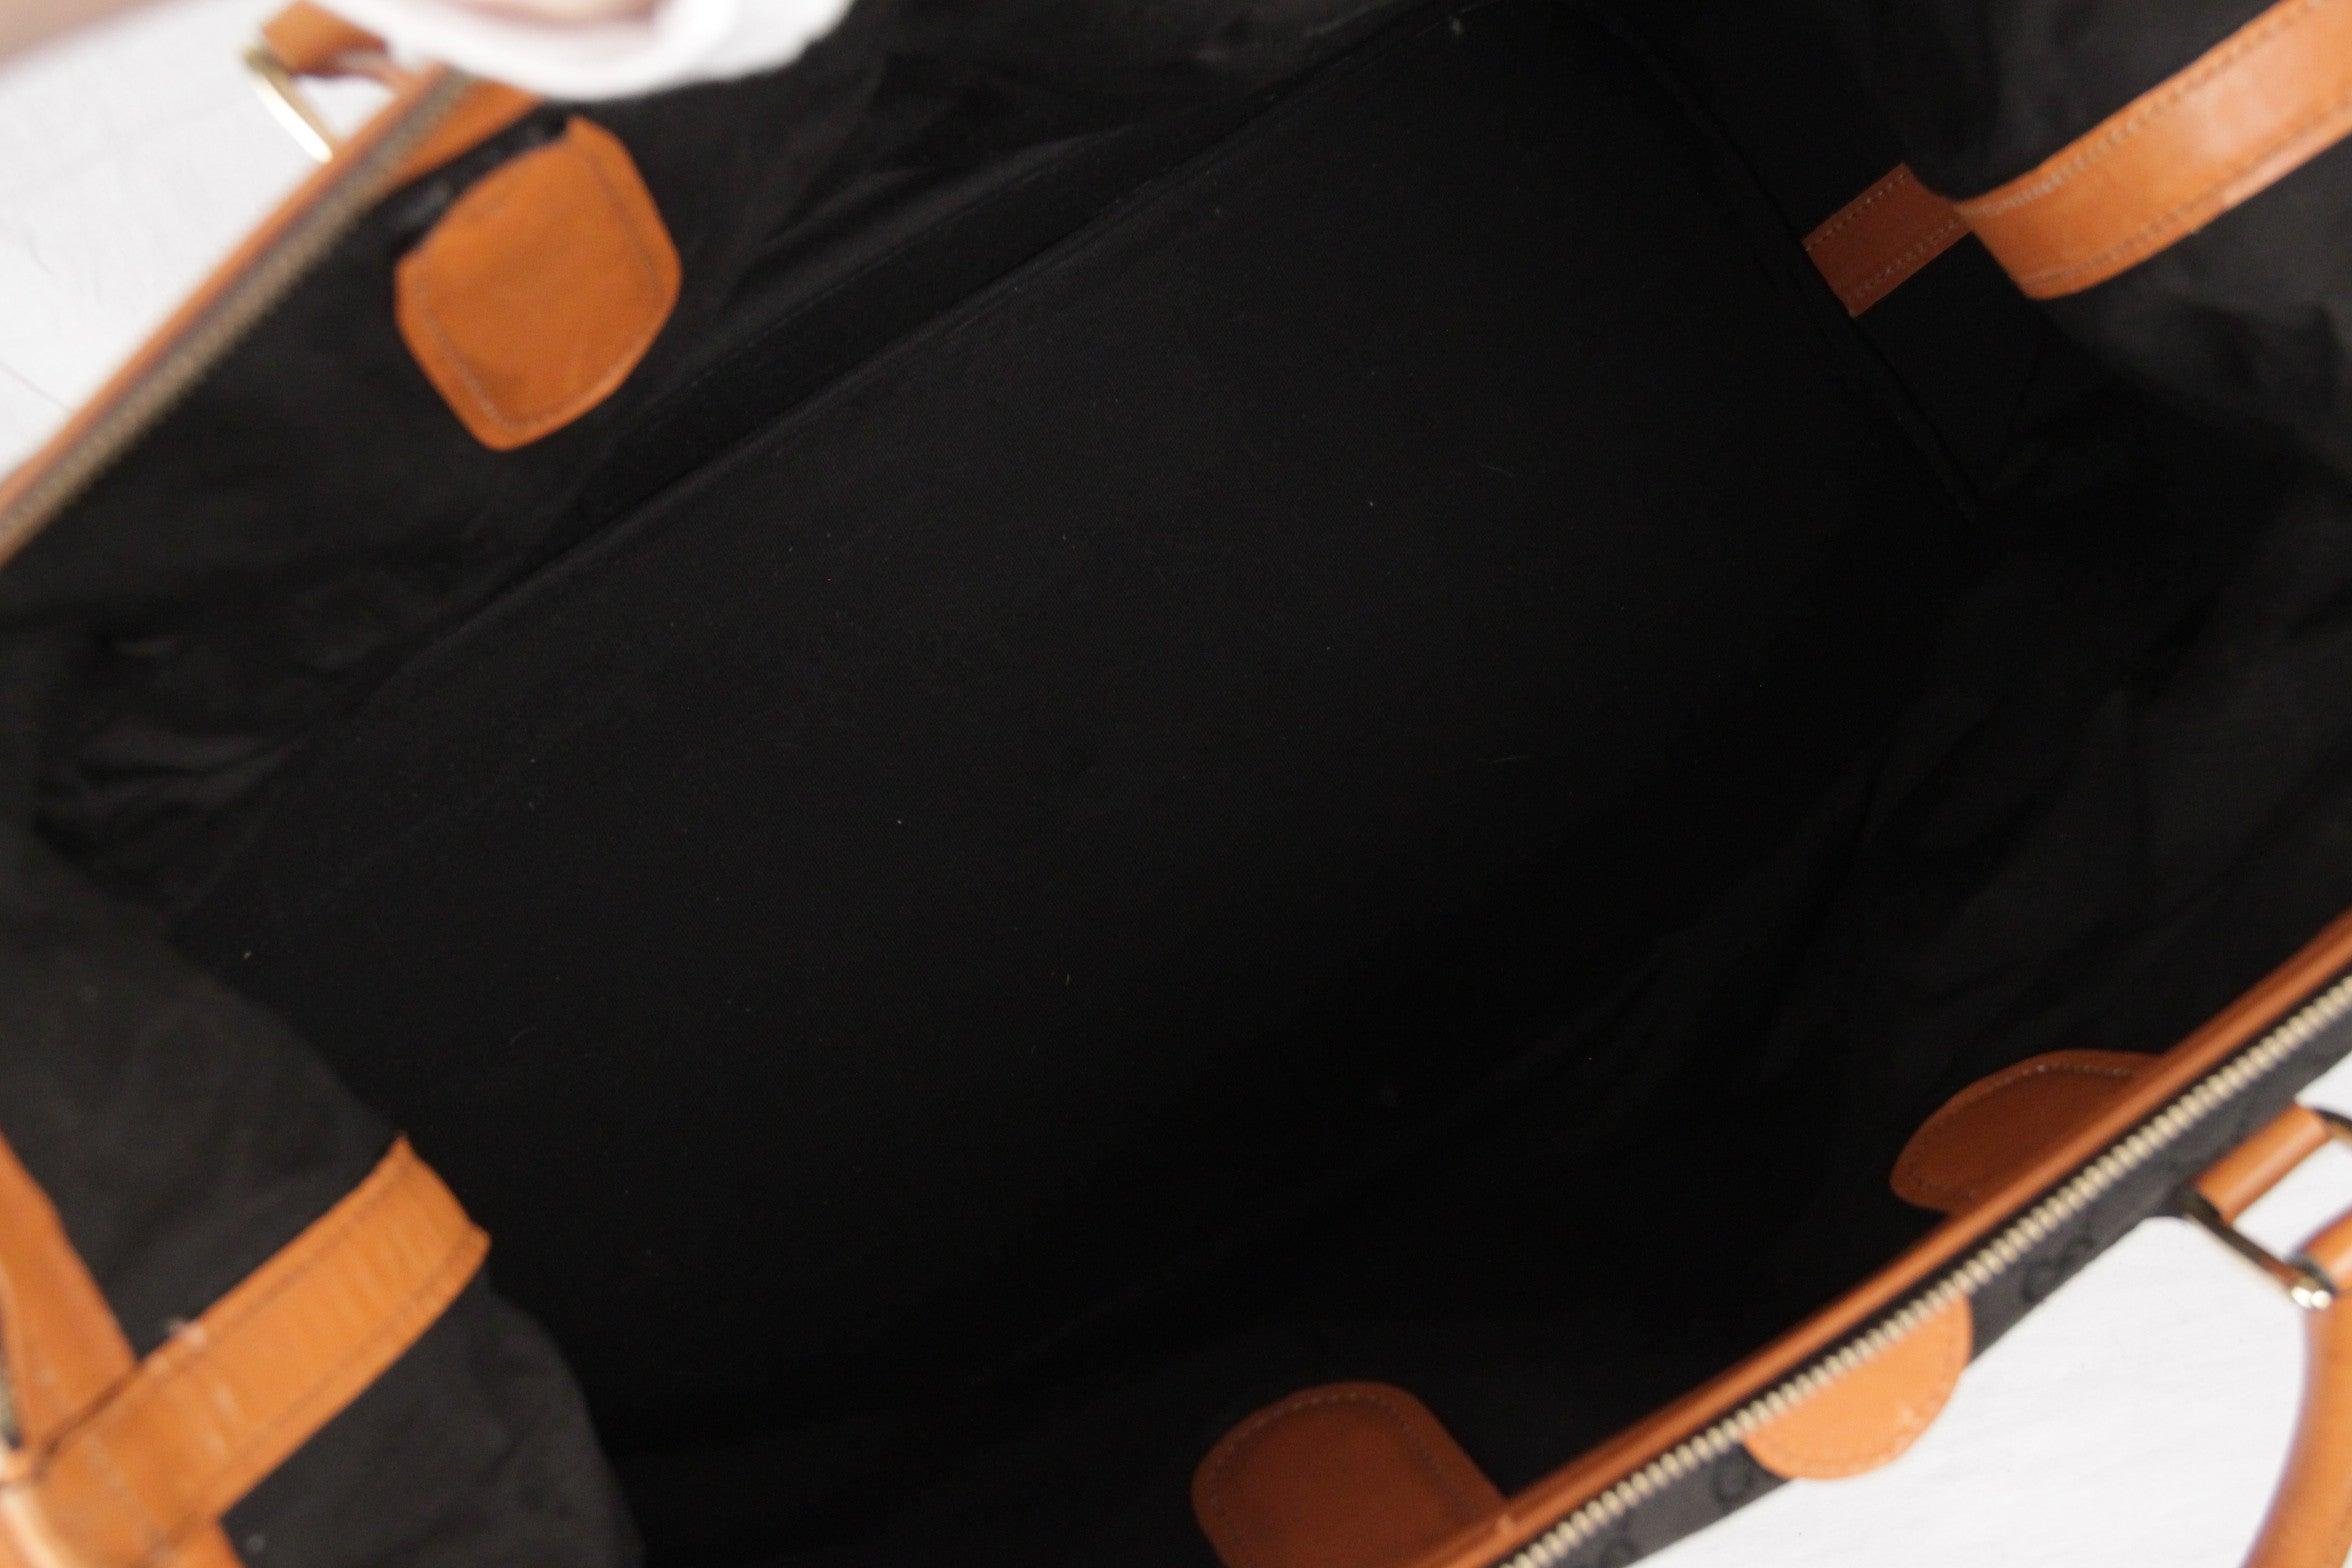 0cbc3277dff GUCCI VINTAGE Black GG MONOGRAM Canvas TRAVEL BAG Weekender at 1stdibs